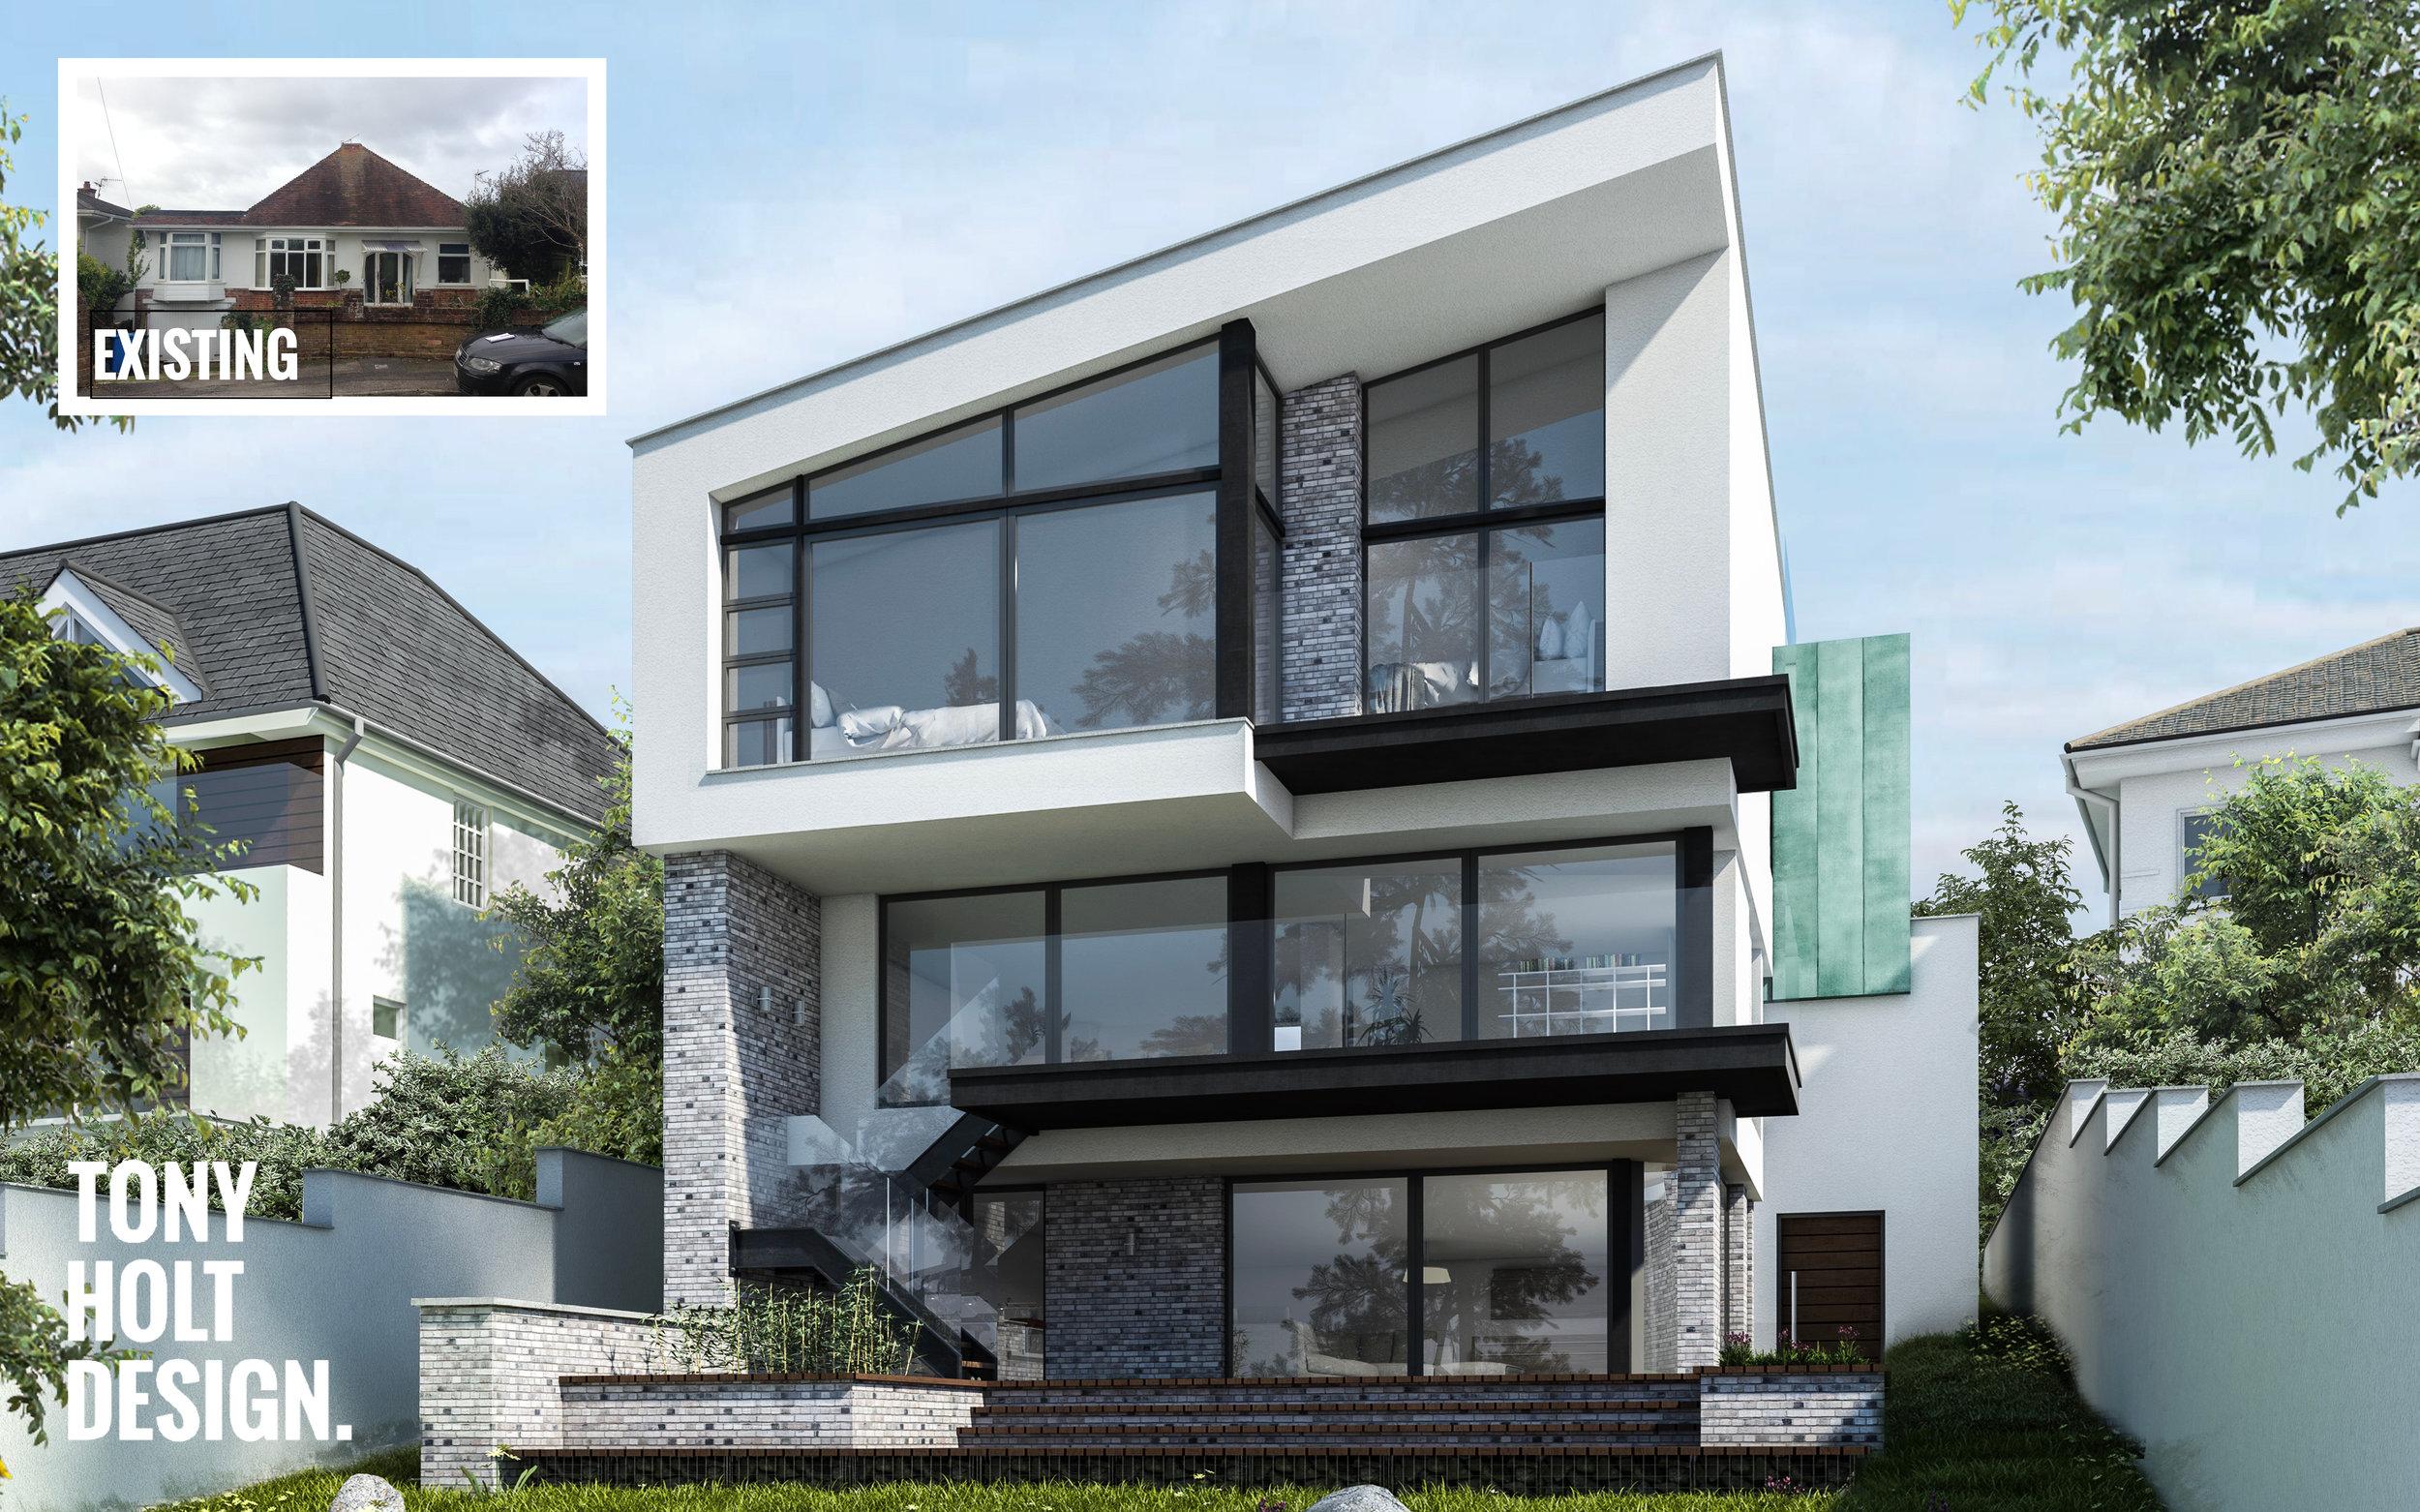 Tony Holt Design_Excelsior Road_Self Build_Remodel_CGI_Rear_Logo.jpg